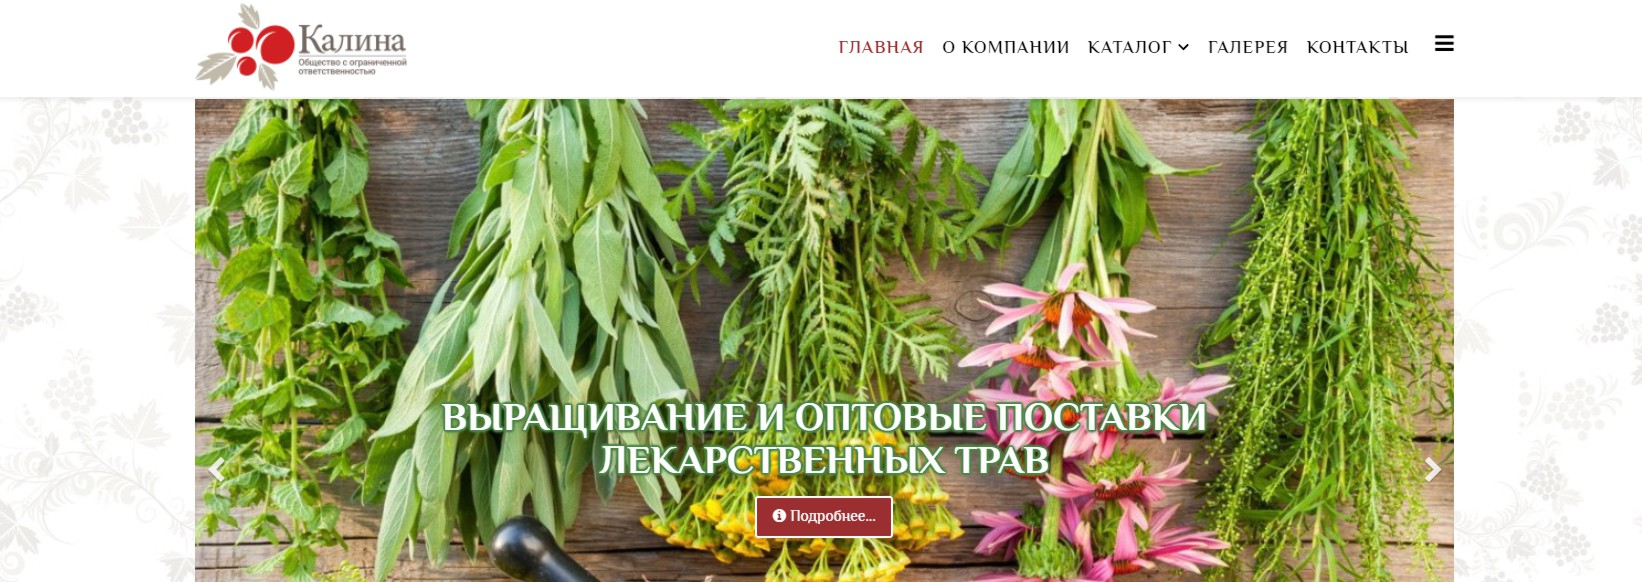 Разработка сайтов в Минске